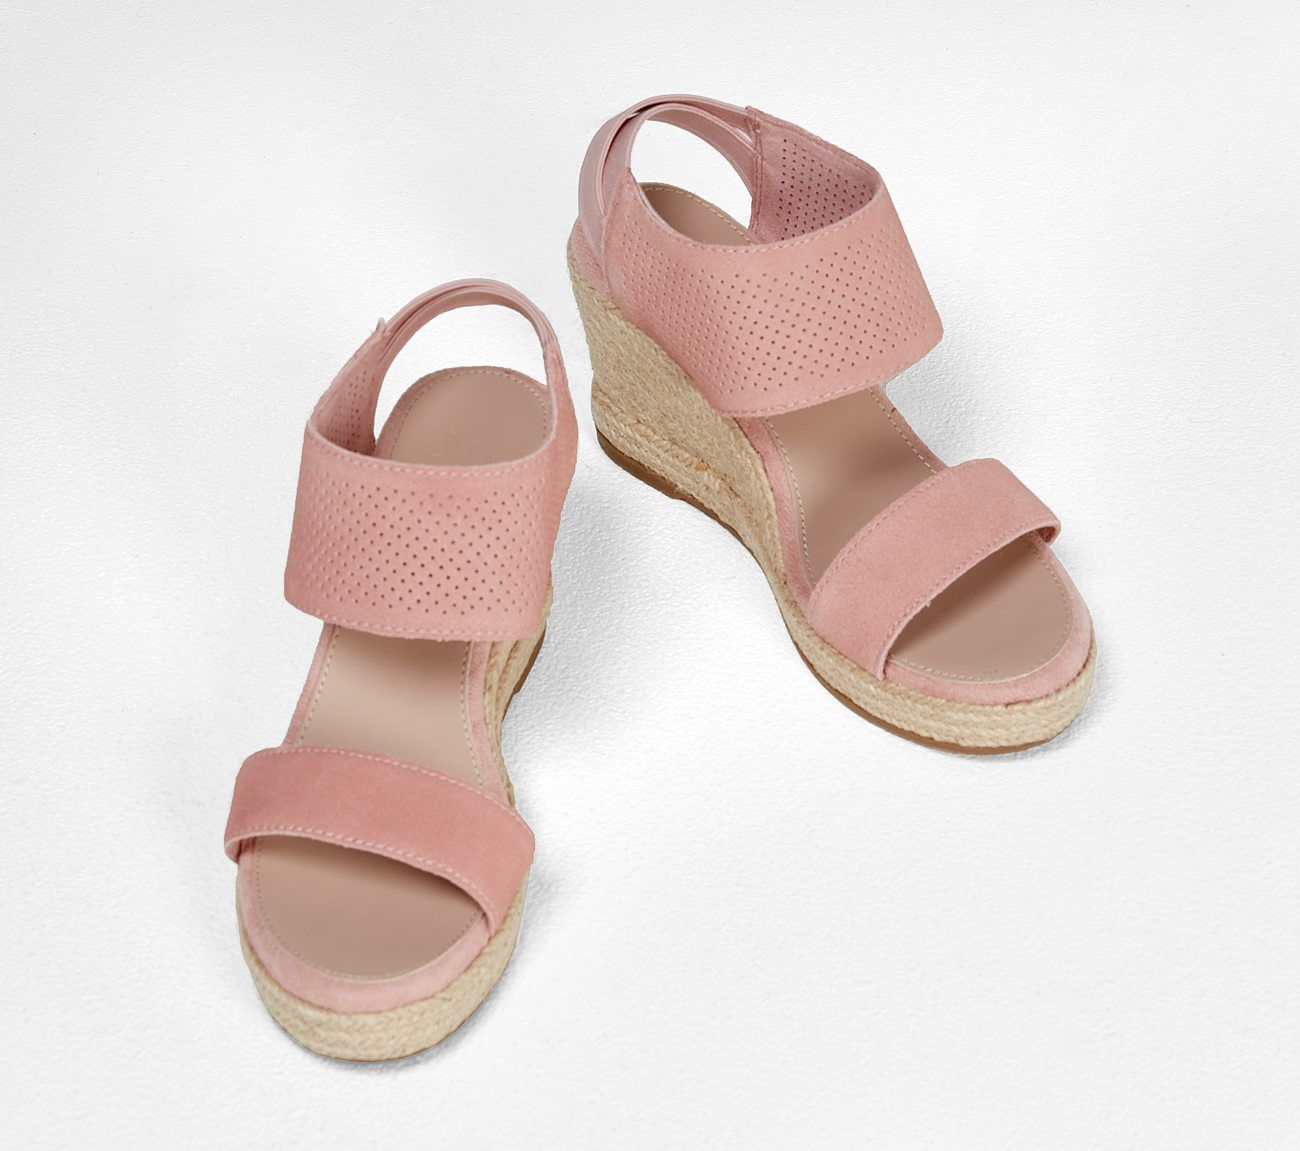 Shop The Indigo Sky River Double Sandal In 2020 Womens Sandals Skechers Sandals